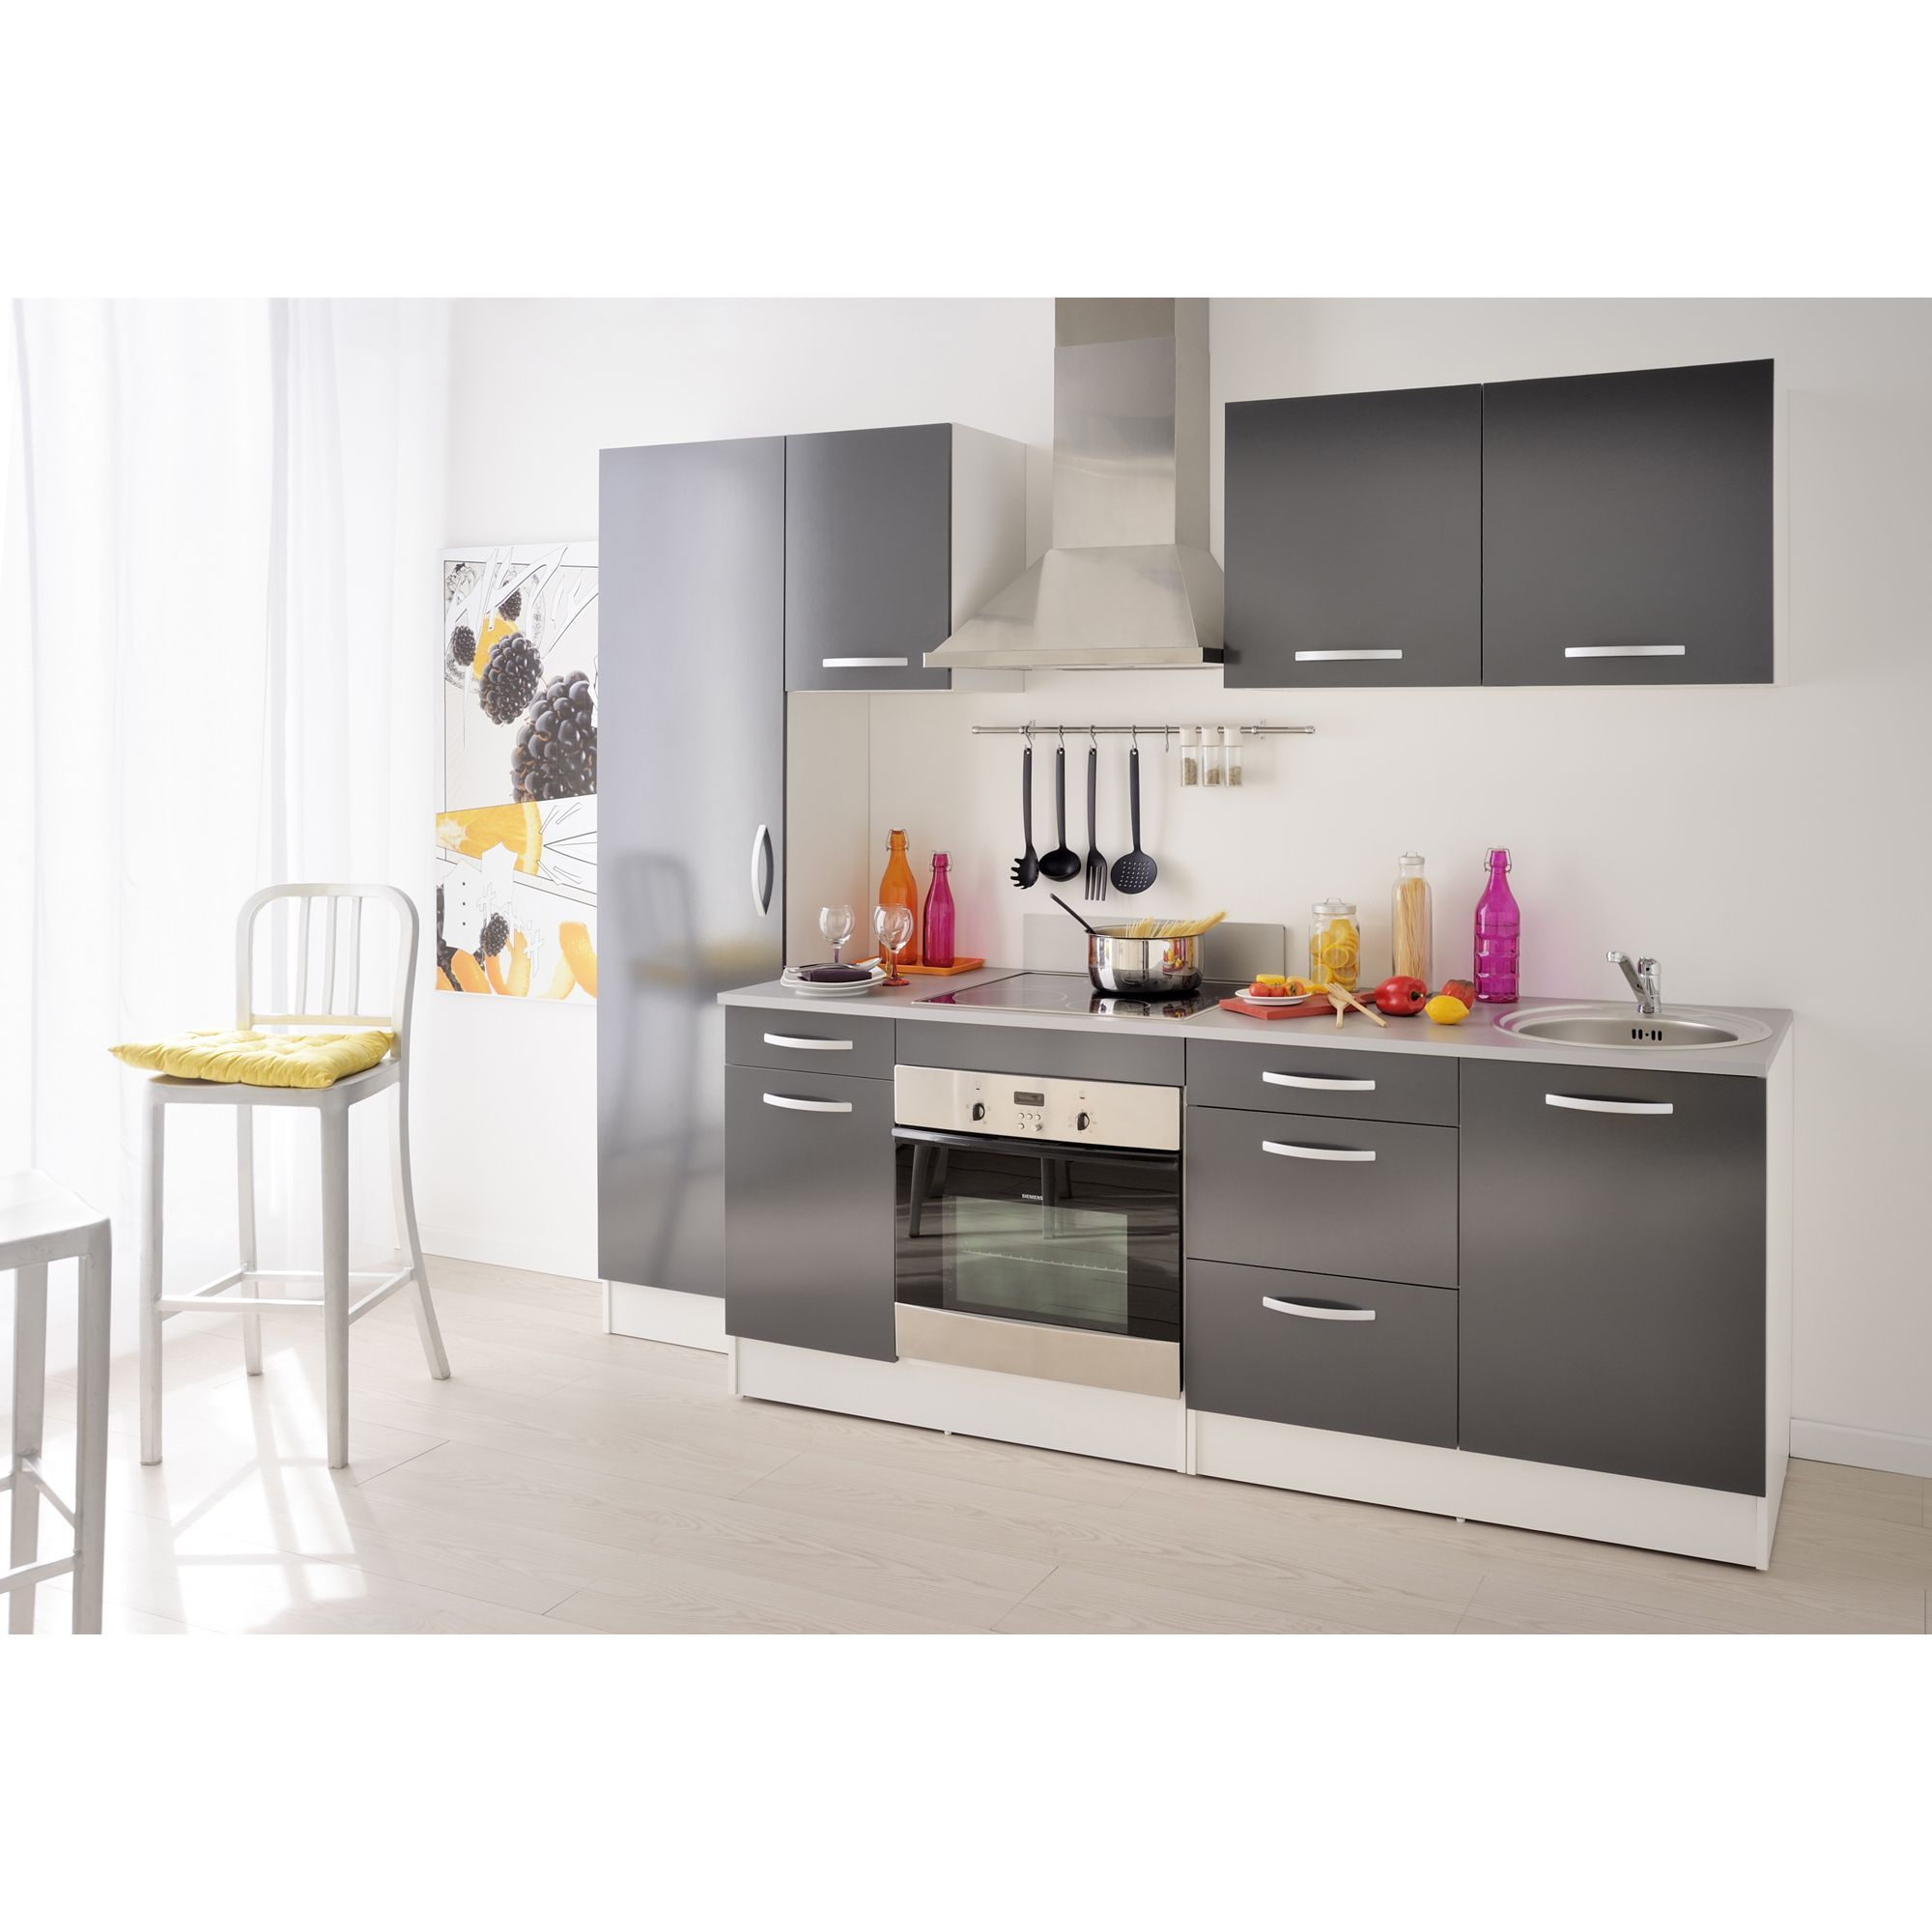 eko cuisine cuisines modulables meubles de cuisine gamme de meubles de cuisine gris pour la. Black Bedroom Furniture Sets. Home Design Ideas